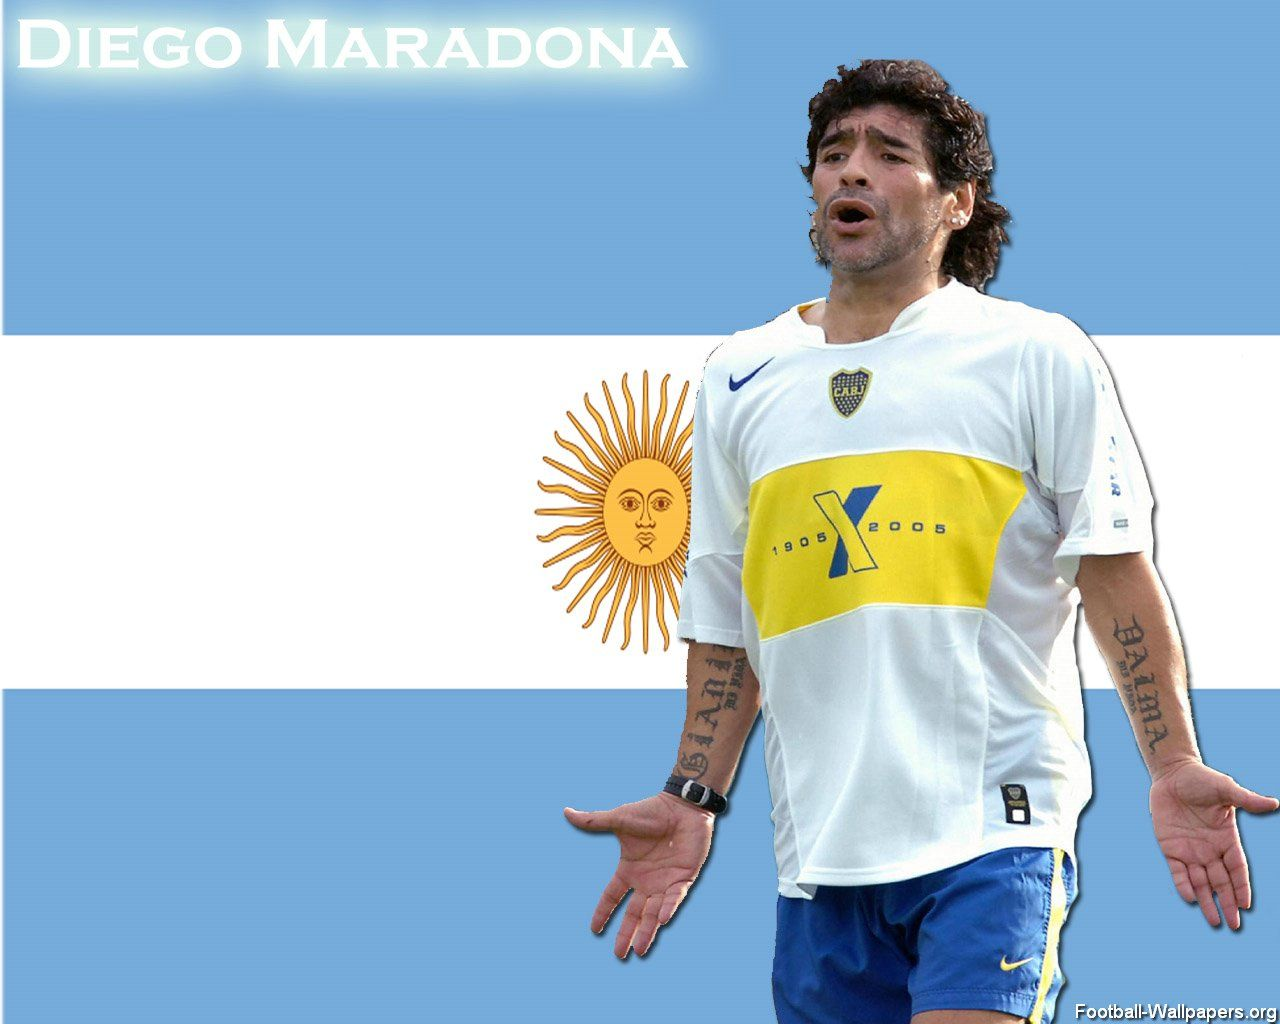 Diego Maradona Wallpaper Diego Maradona Mens Tops Mens Tshirts